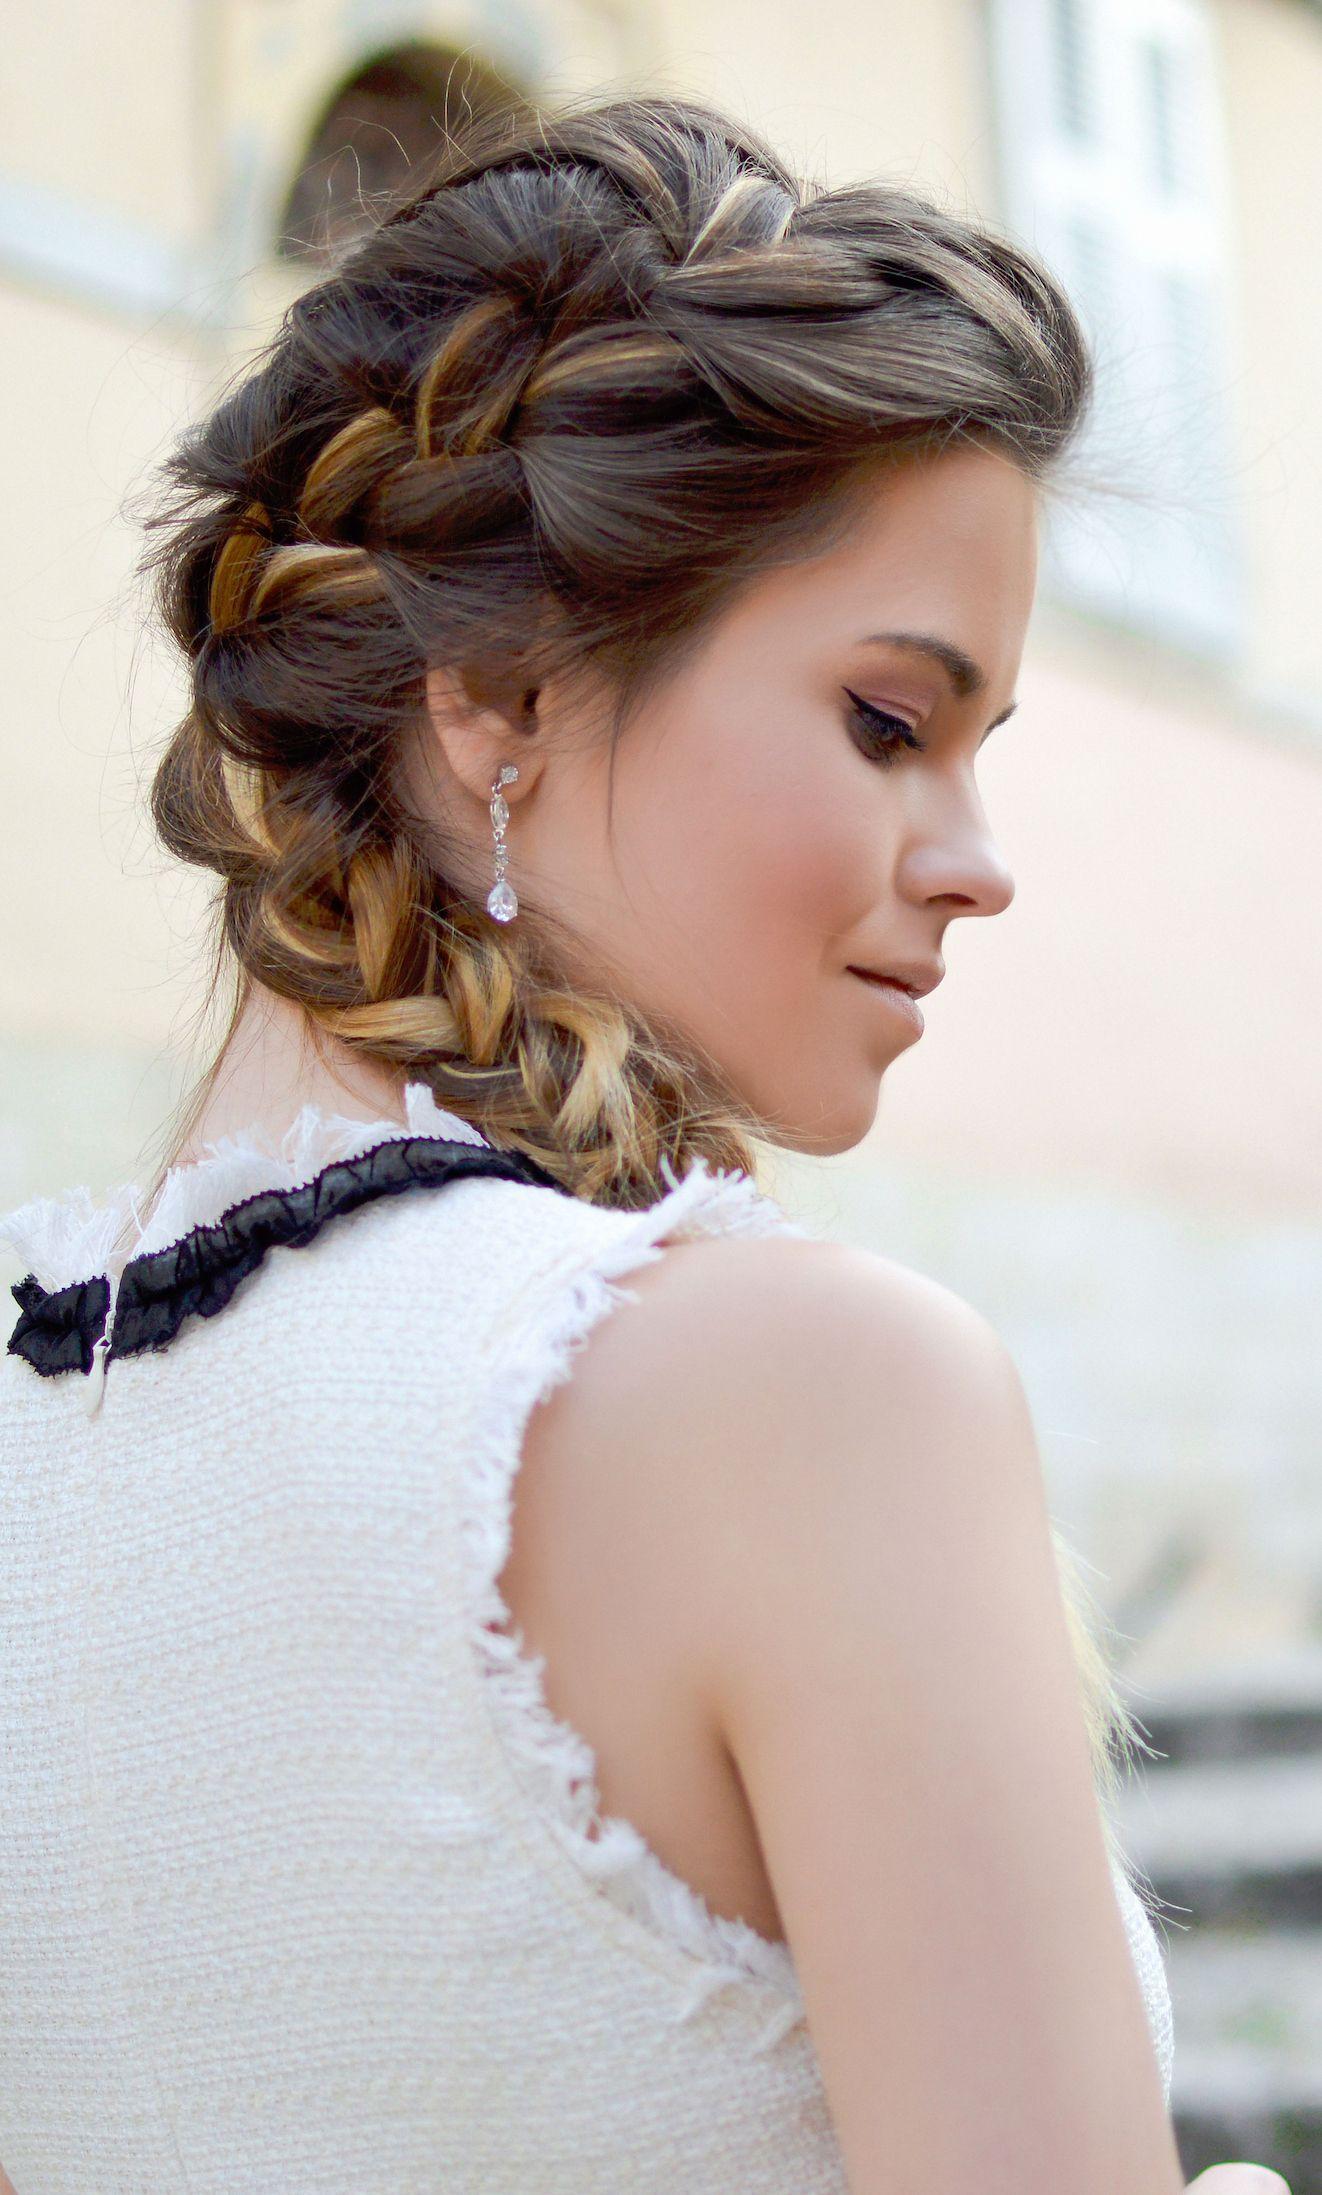 Braided ponytail hairstyles pretty in pinterest hair